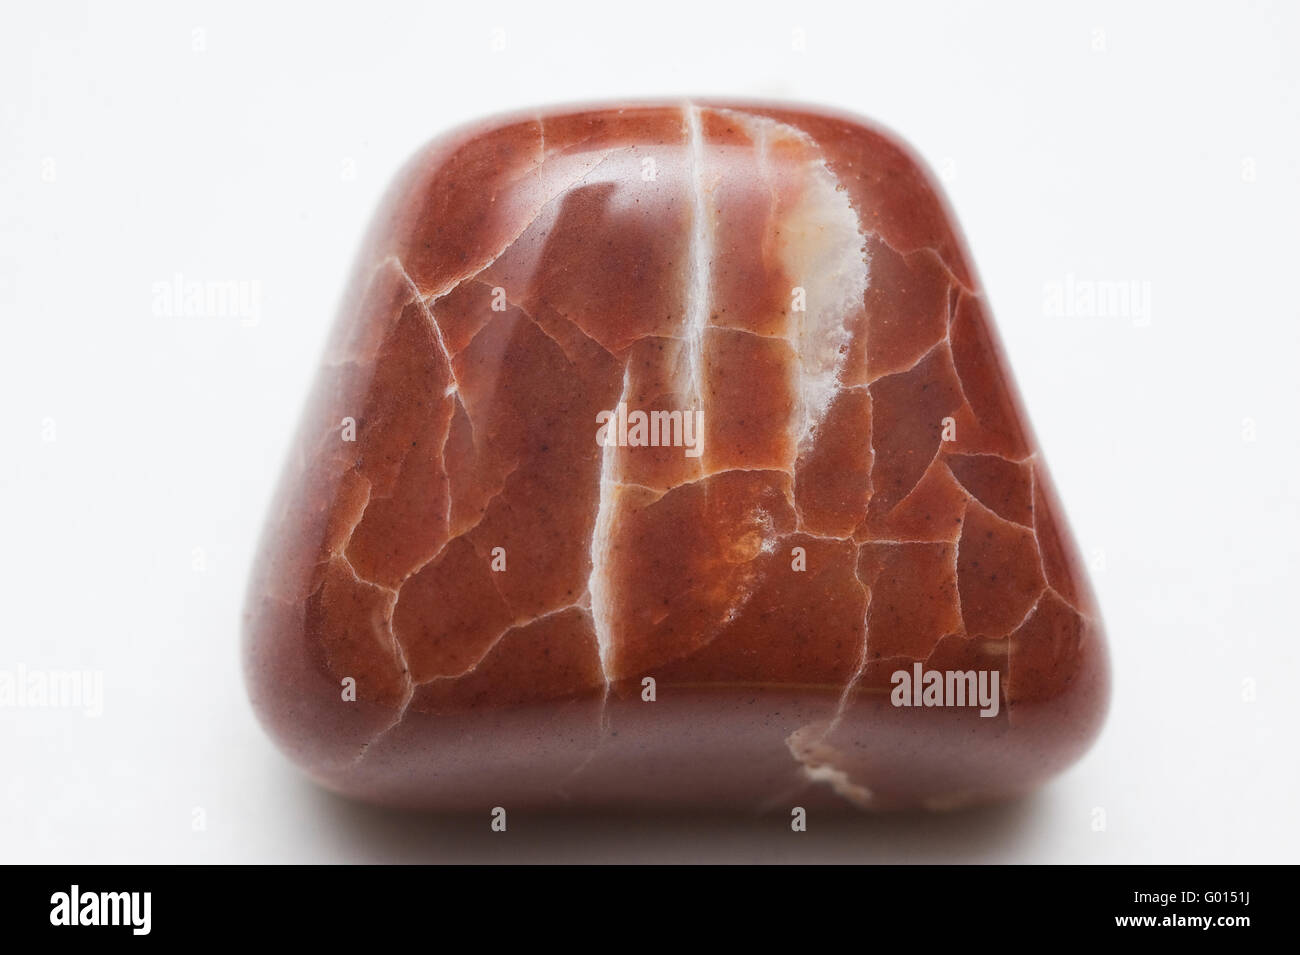 Fractured Jasper (SiO2) Microcrystalline Quartz, Pebble (1 inch high) Puget Sound, Washington - Stock Image